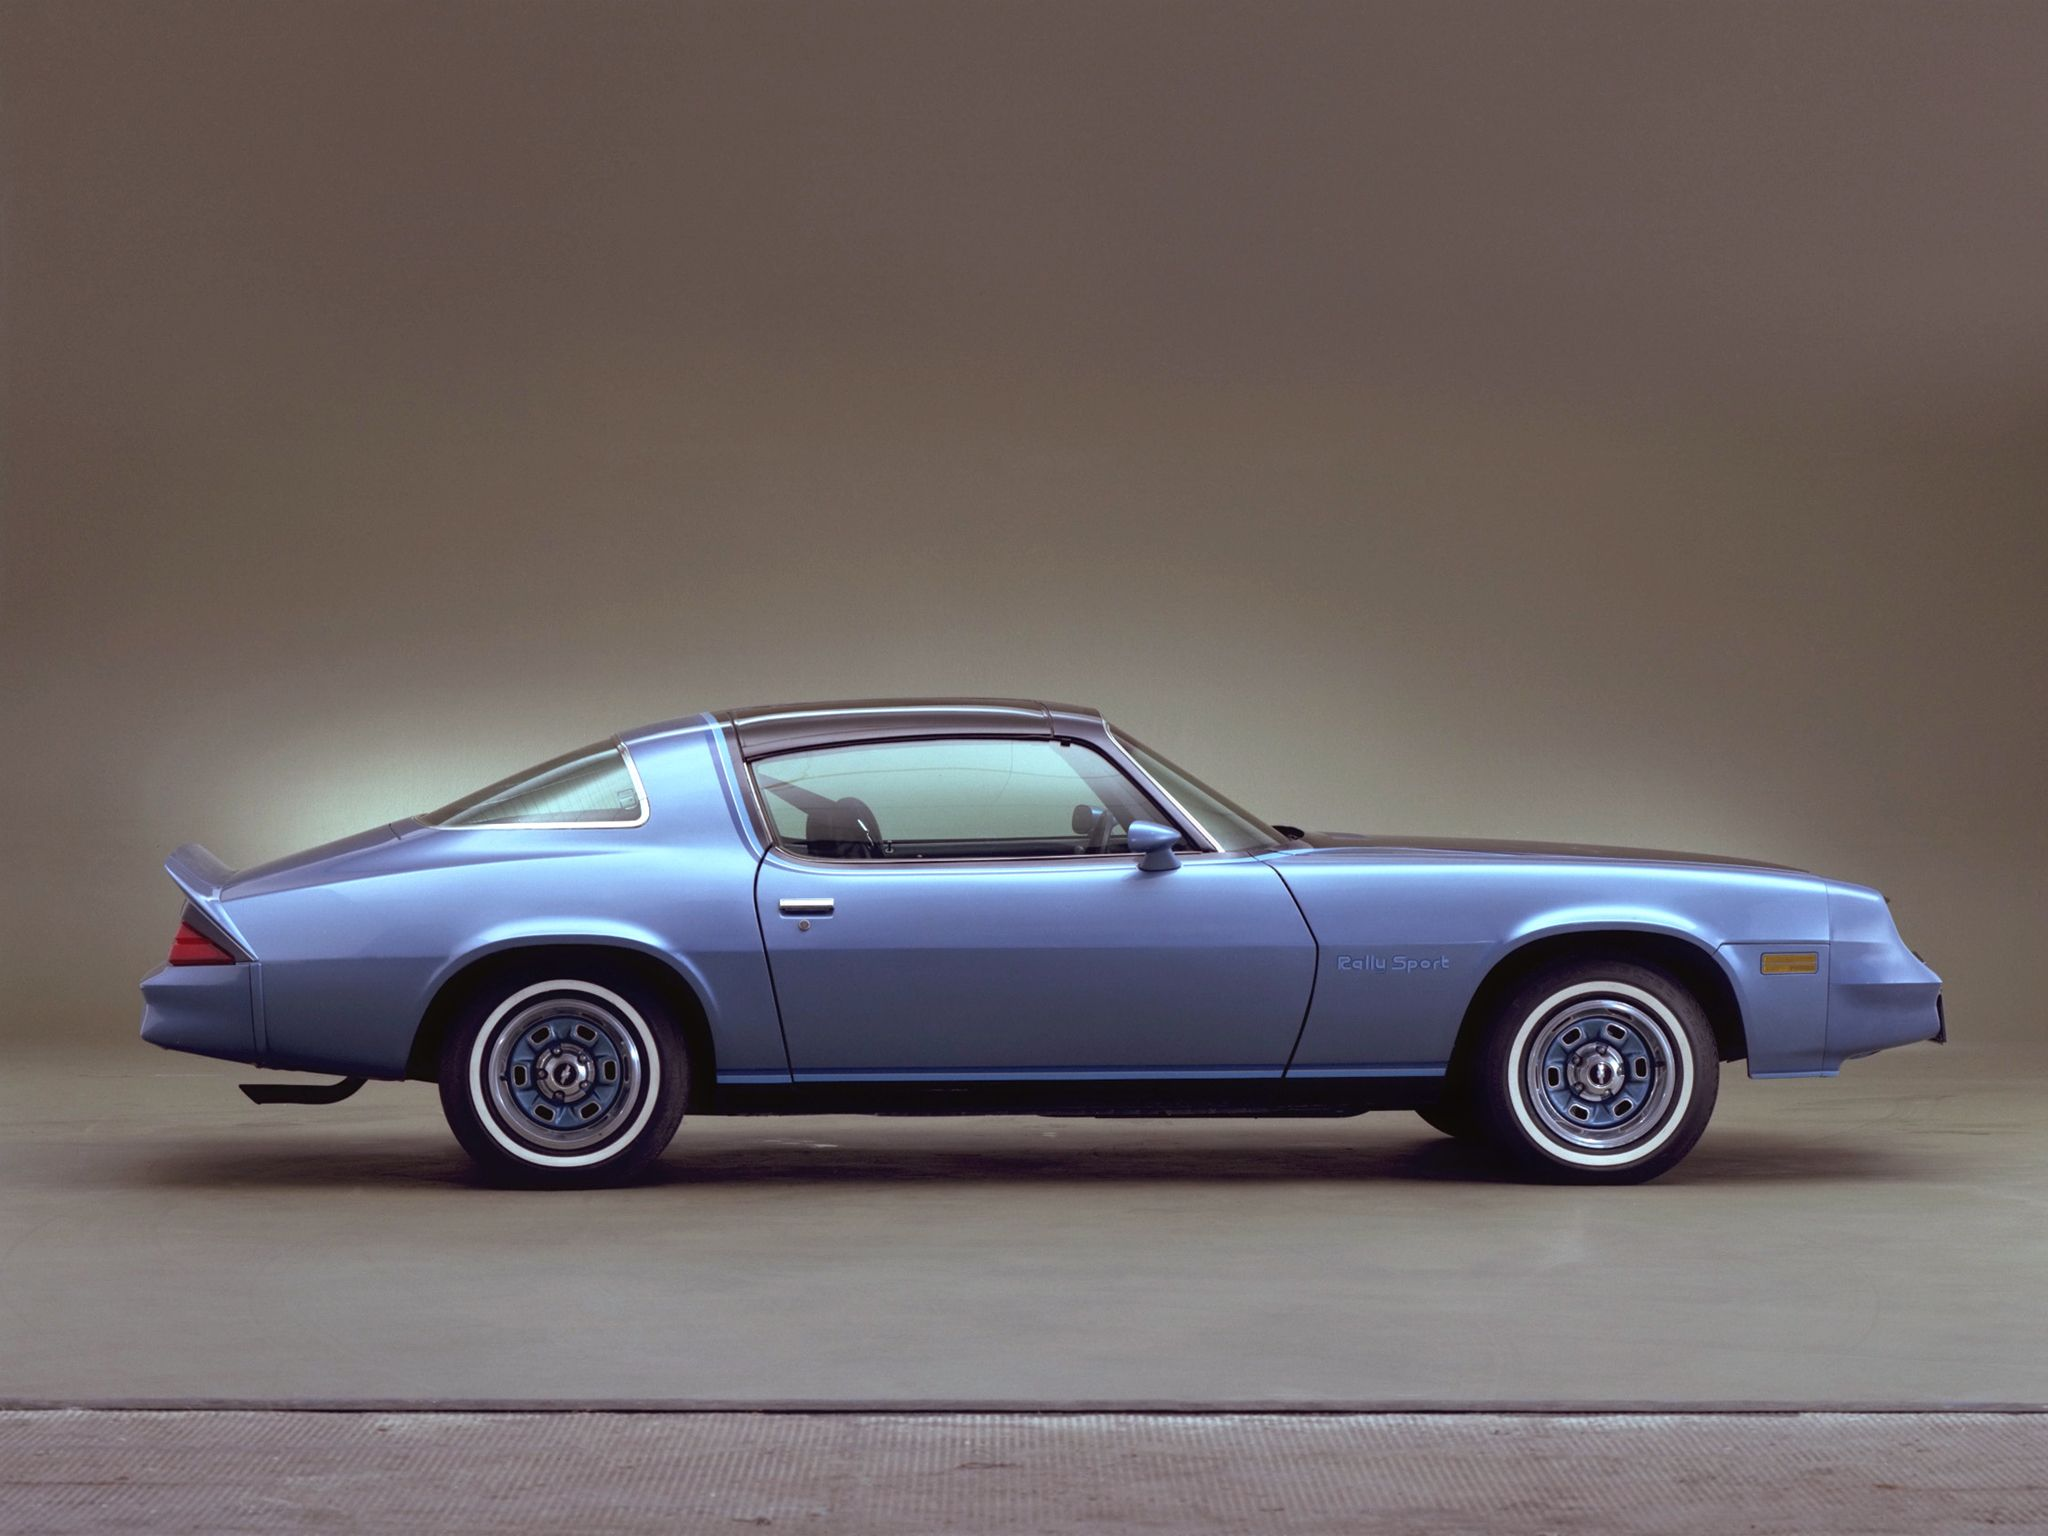 1978 chevrolet camaro z28 350 cu v8 185 hp 4 speed sold - Chevrolet Camaro Rs T Top 1978 Wallpaper